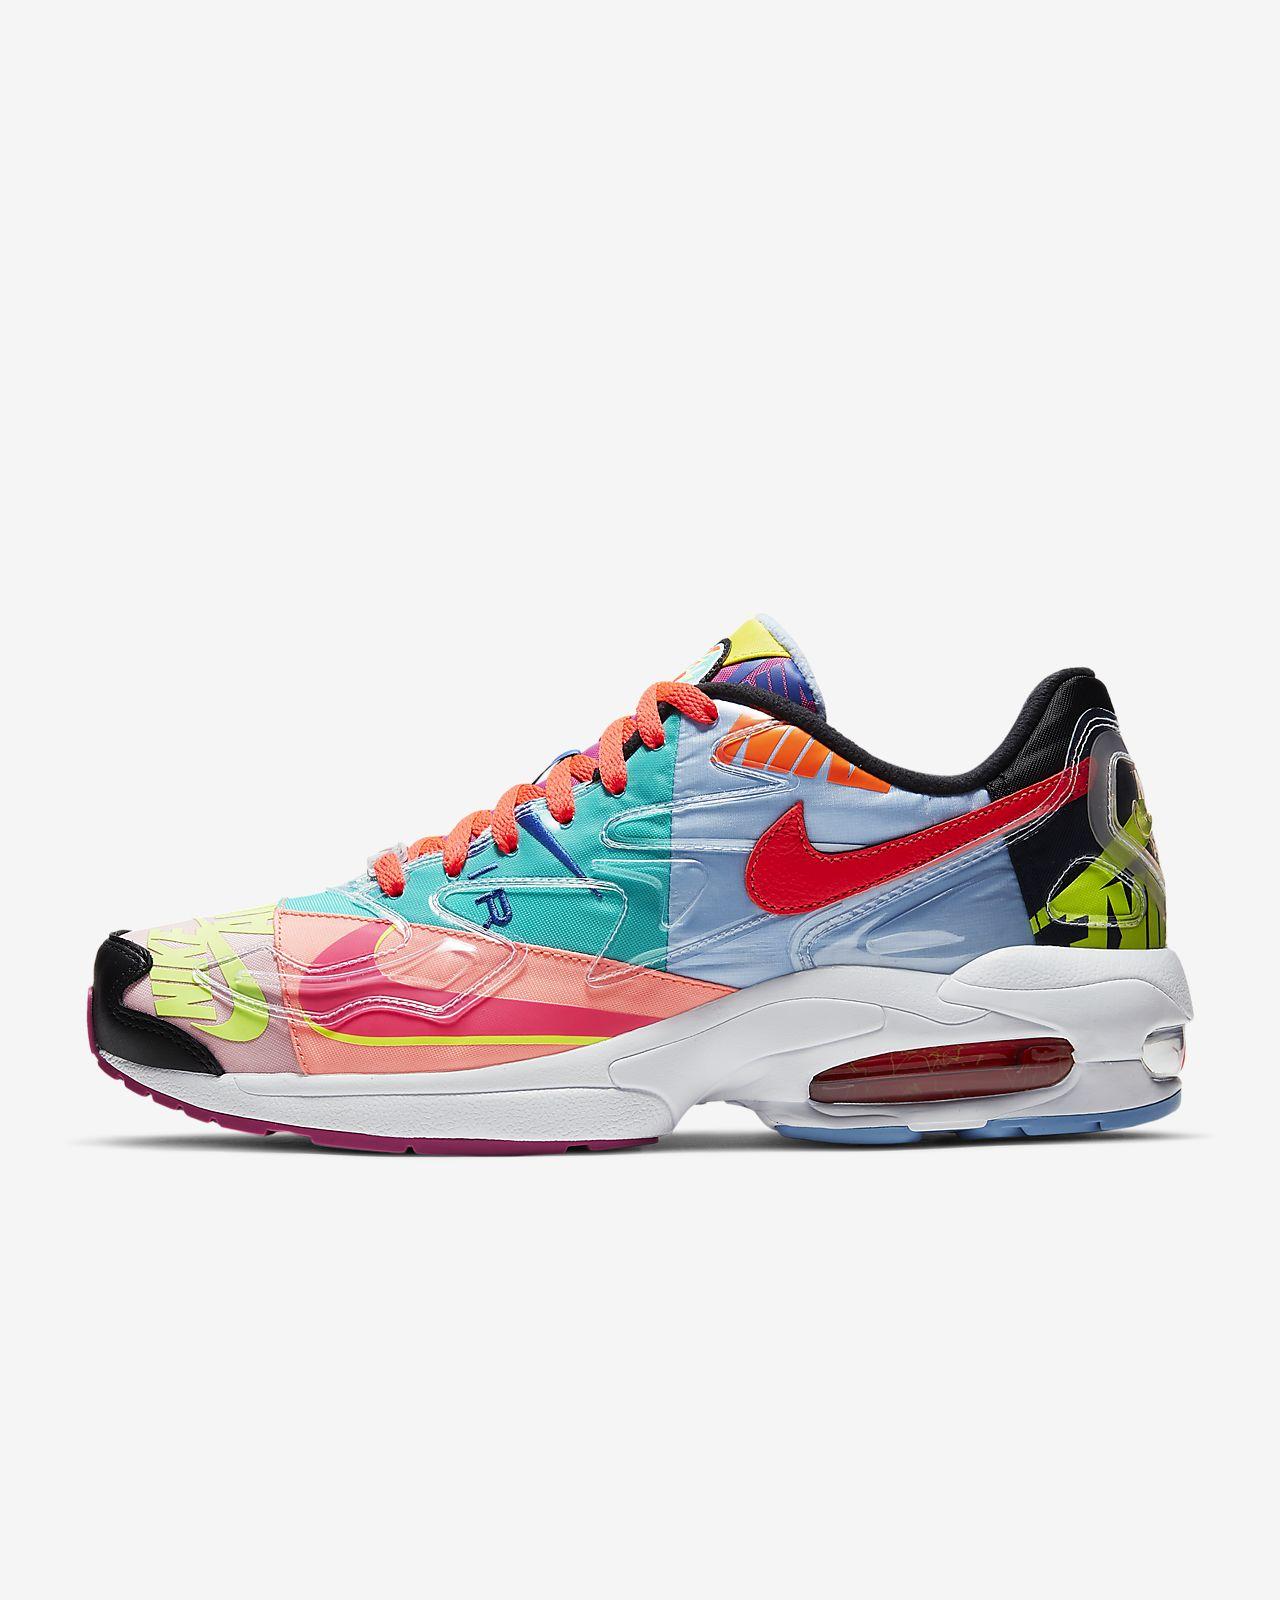 promo code 0ceb9 d8524 ... Nike Air Max2 Light QS Men s Shoe